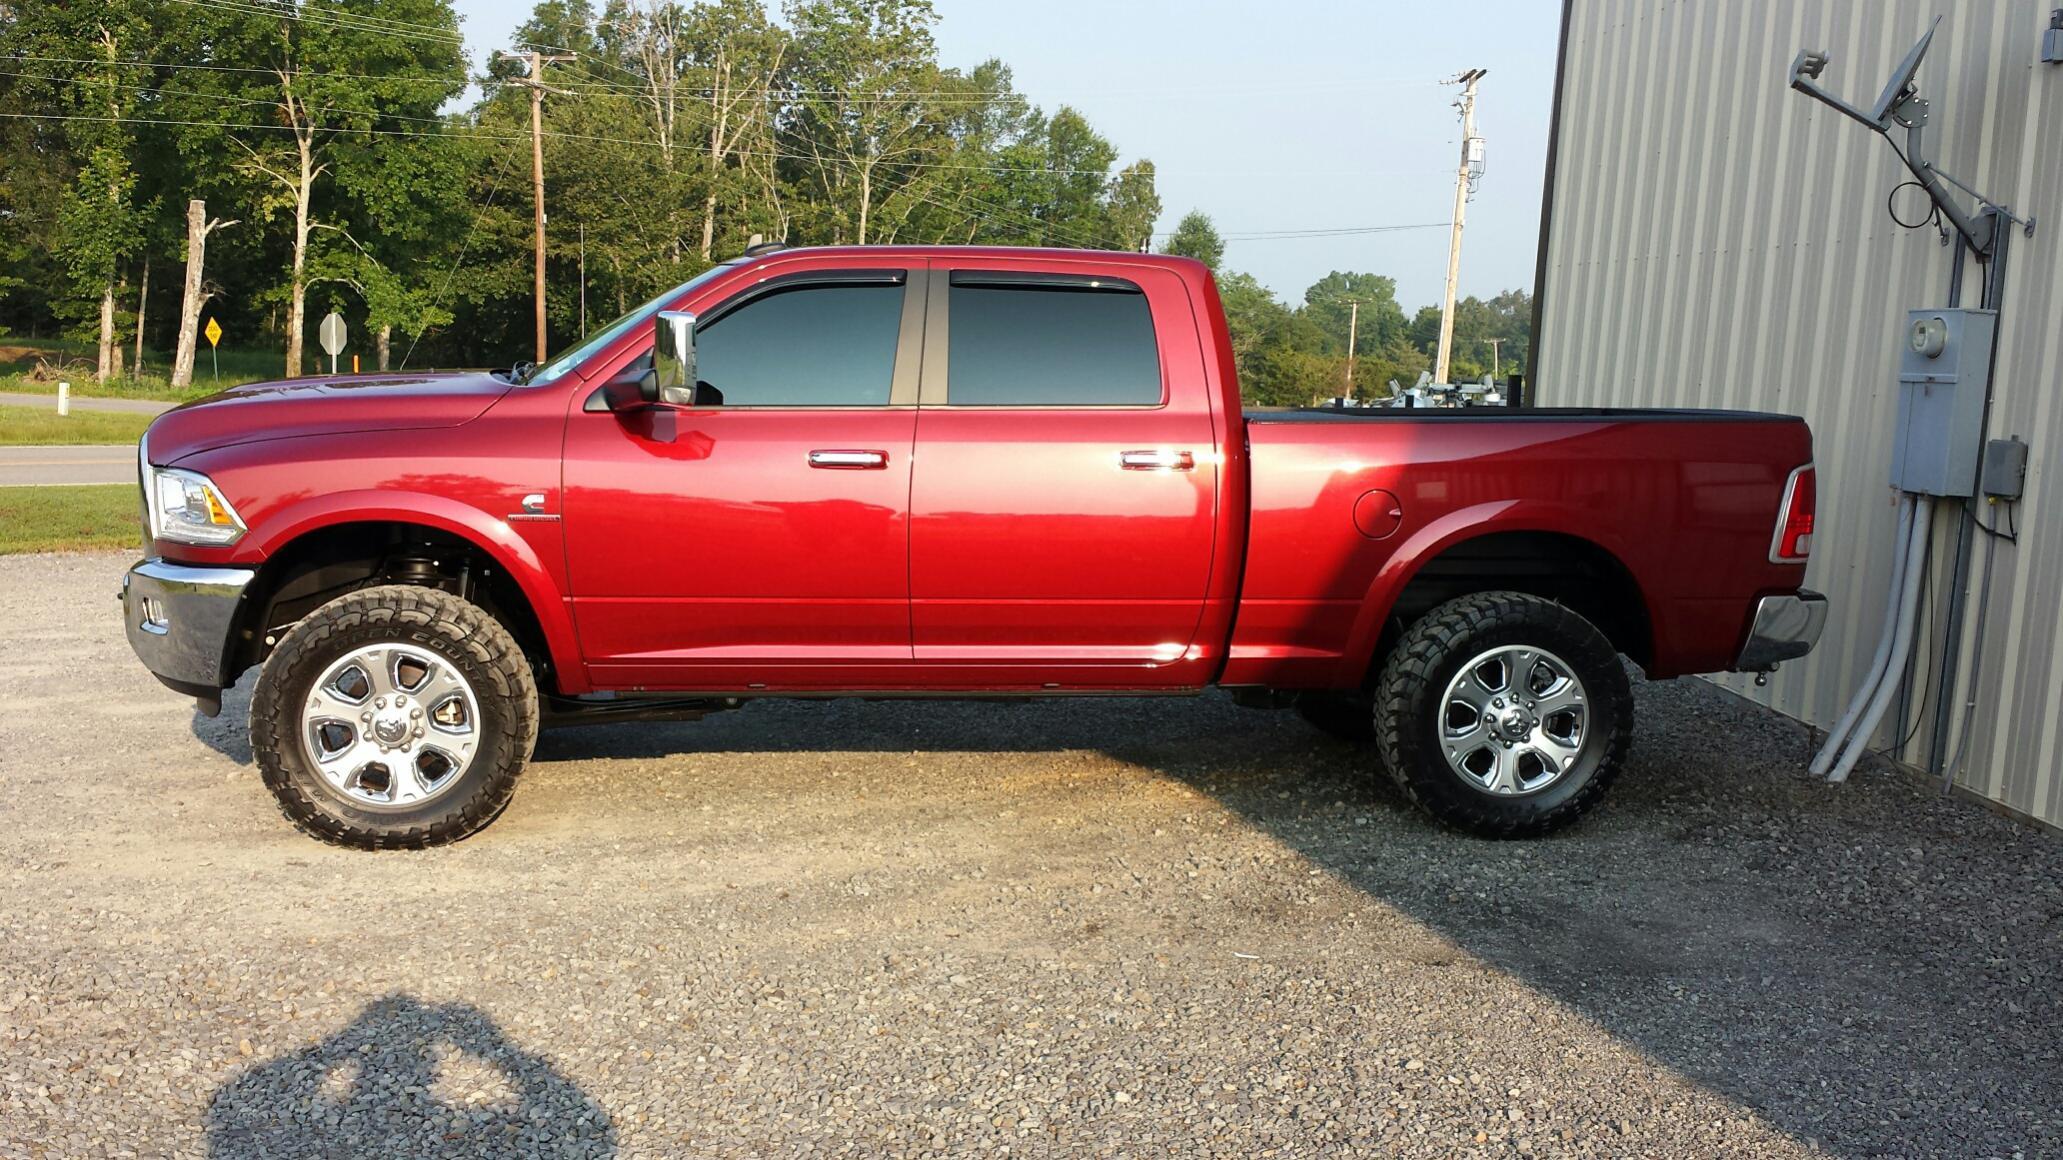 2017 Ram 2500 Leveling Kit >> 2014 2500 -- Tuff Country Leveling Kit - Dodge Cummins Diesel Forum